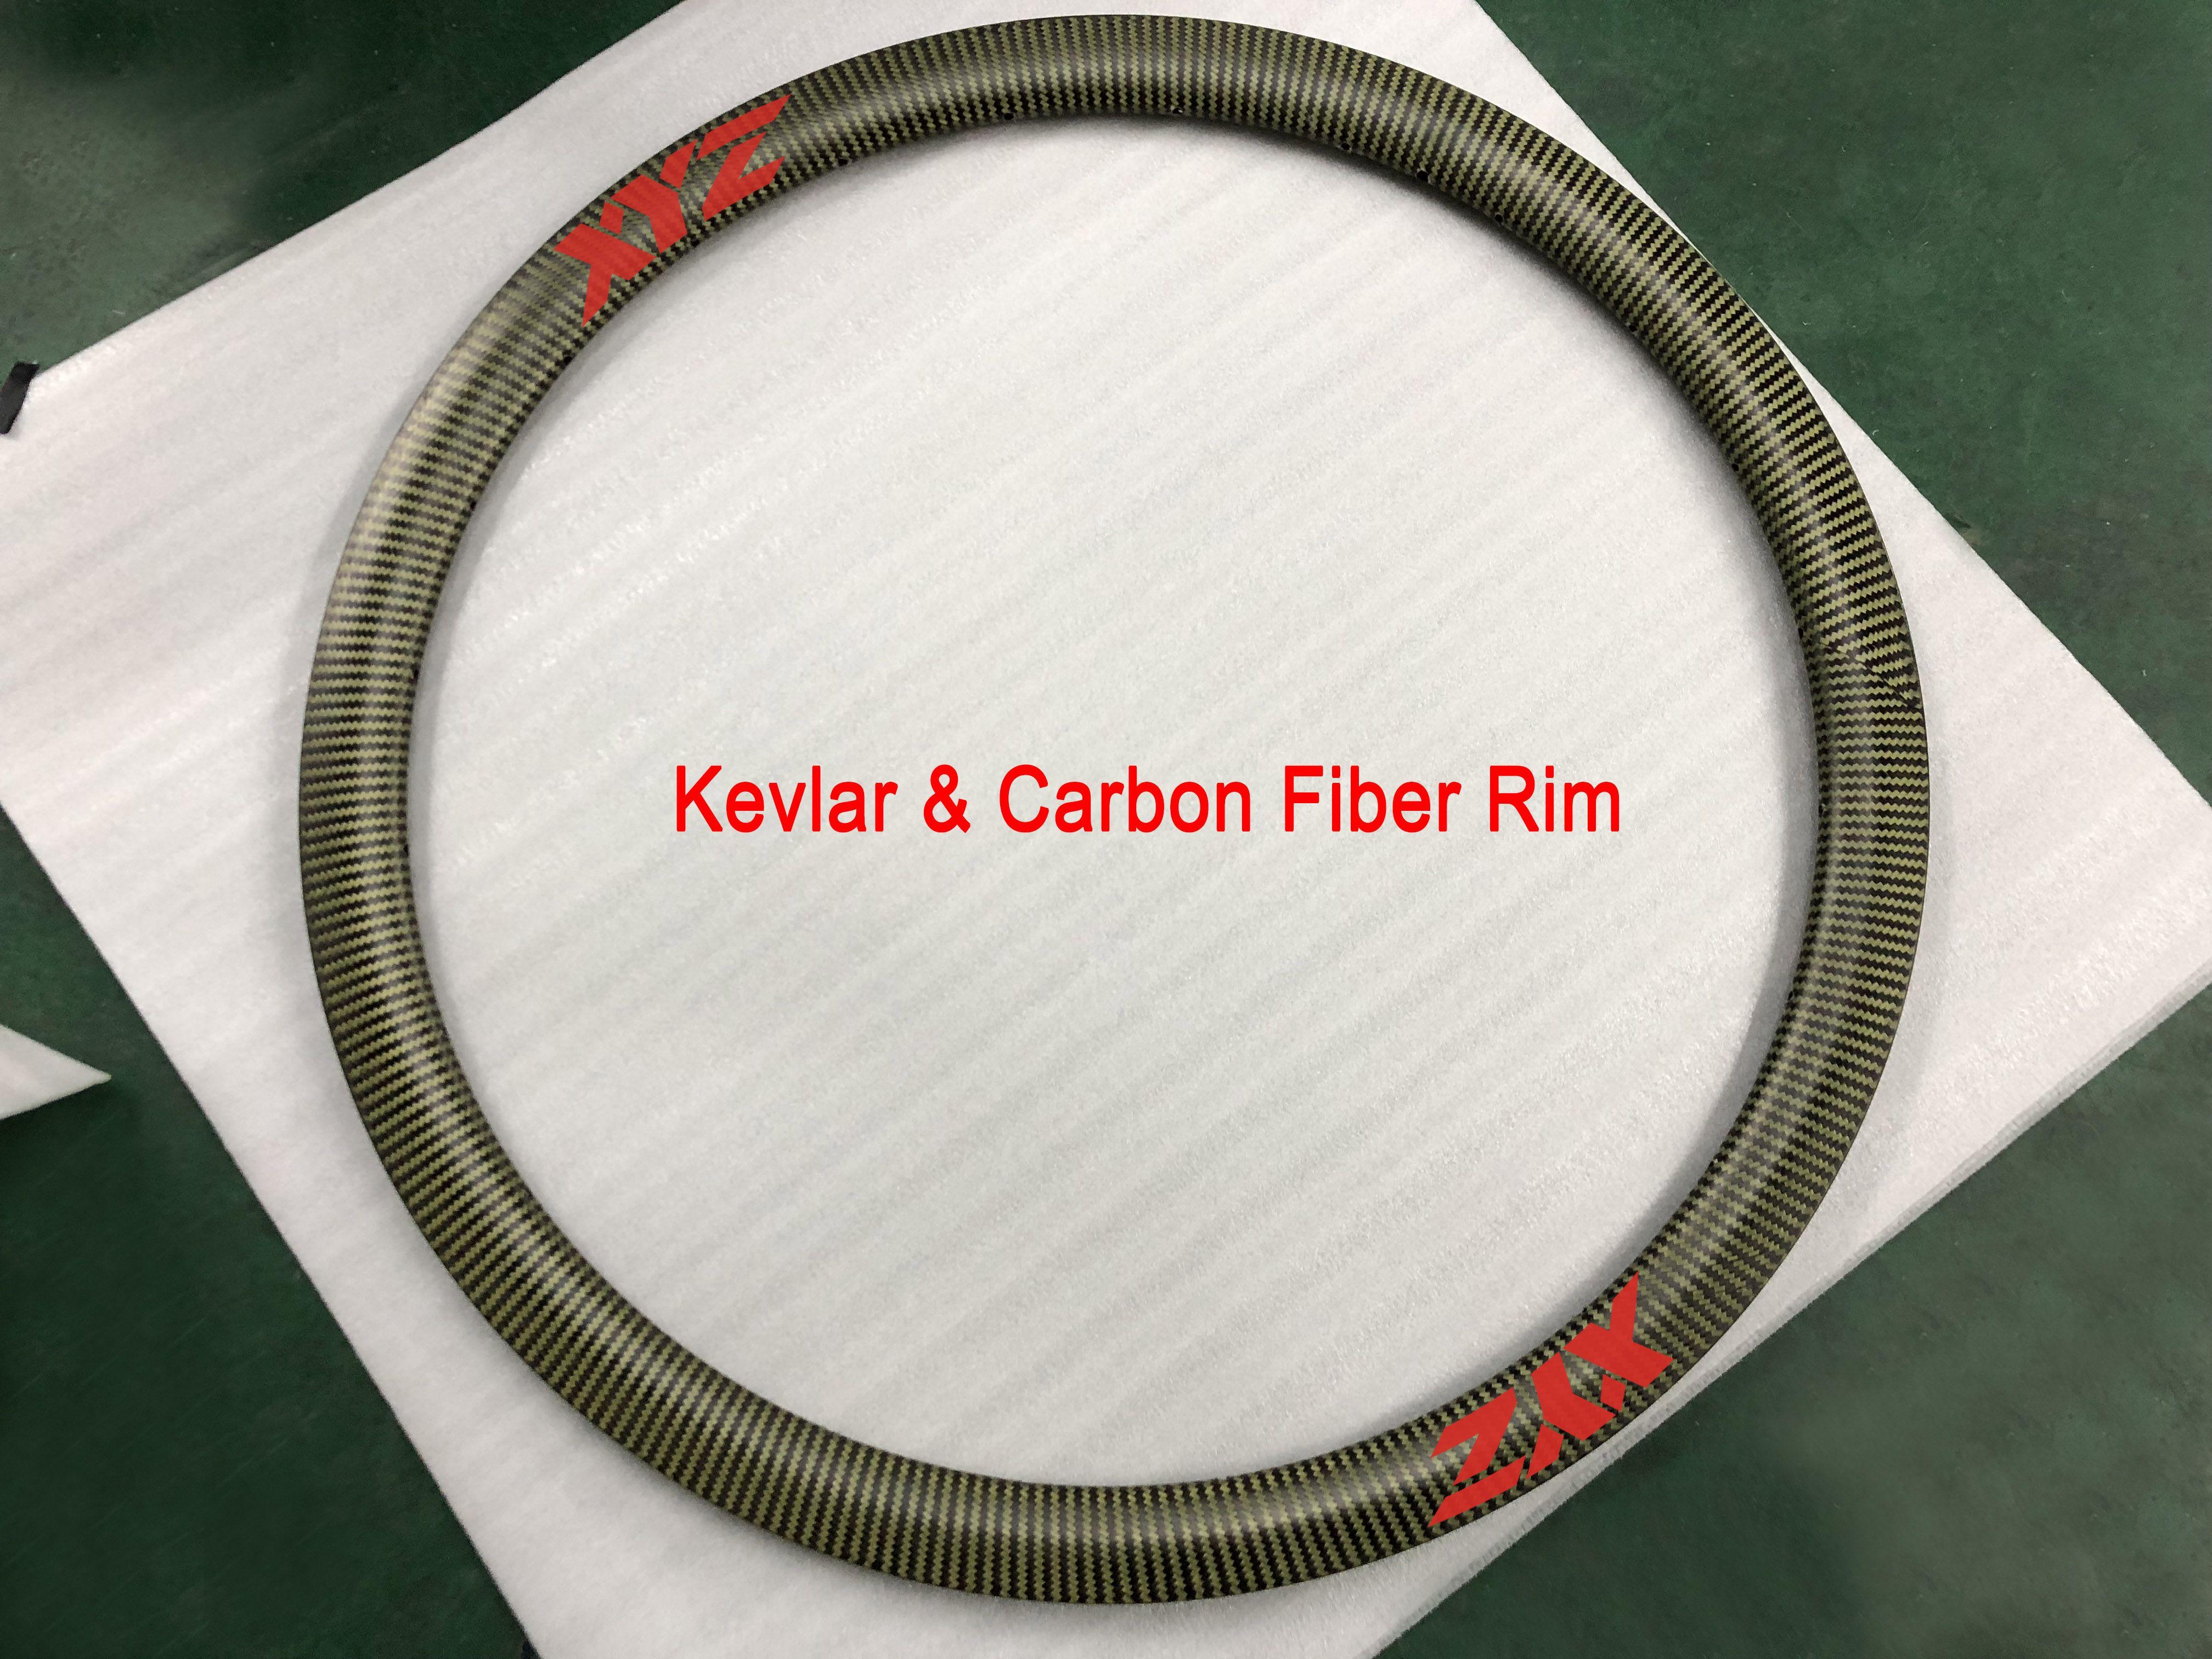 700C 25mm width 60MM depth CLINCHER KEVLAR LIGHT ROAD BICYCLE CARBON RIM